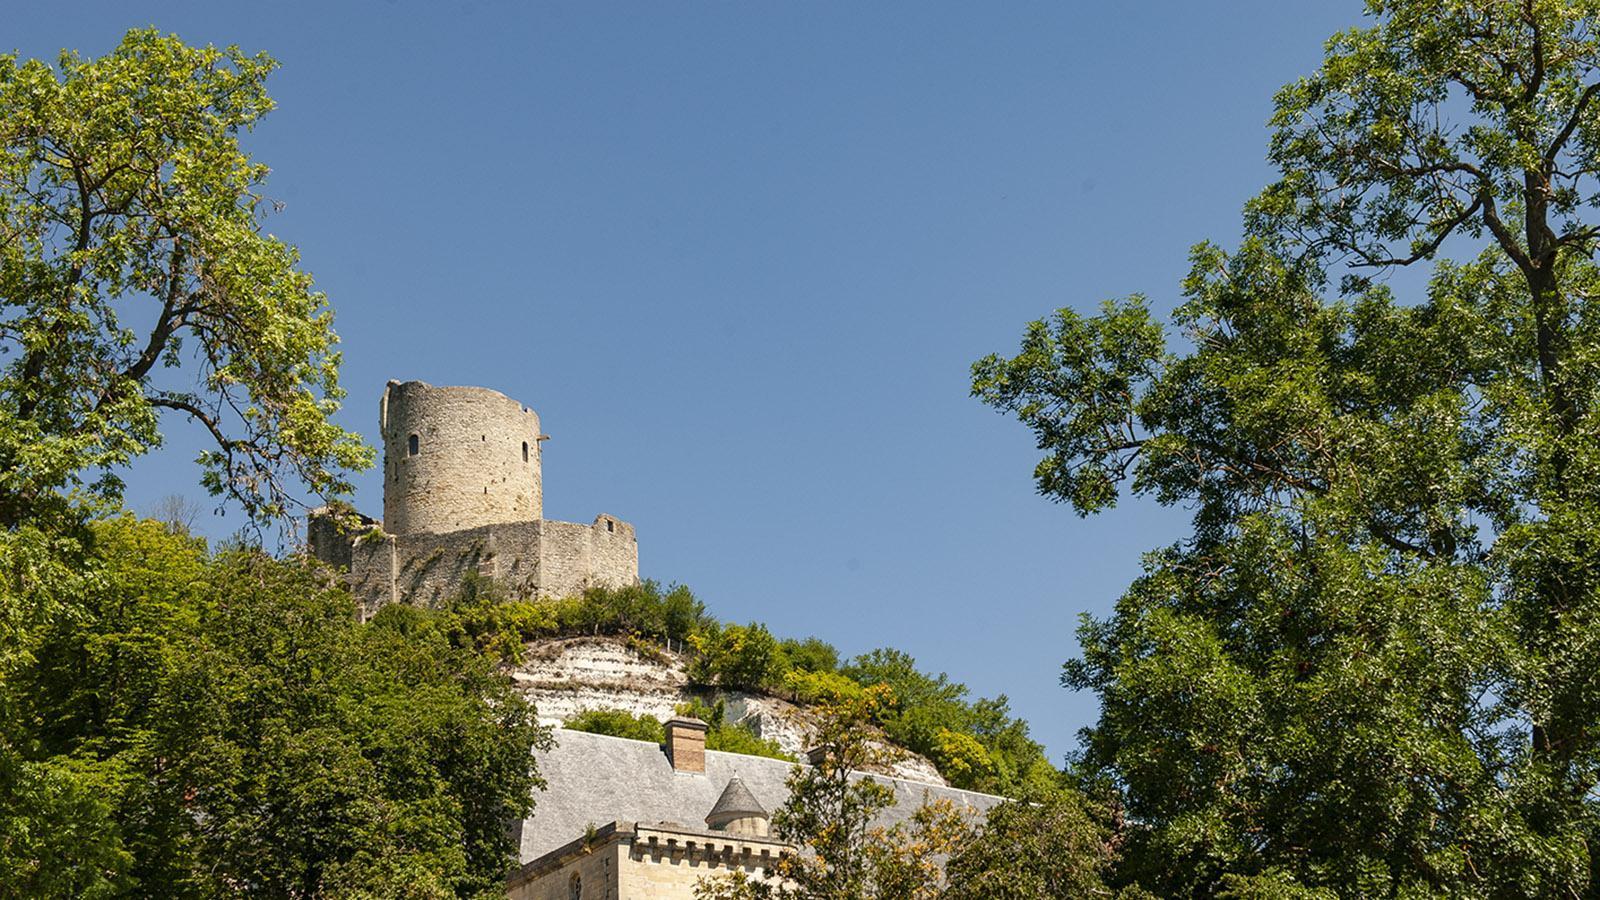 La Roche-Guyon: der Bergfried der Burg. Foto: Hilke Maunder